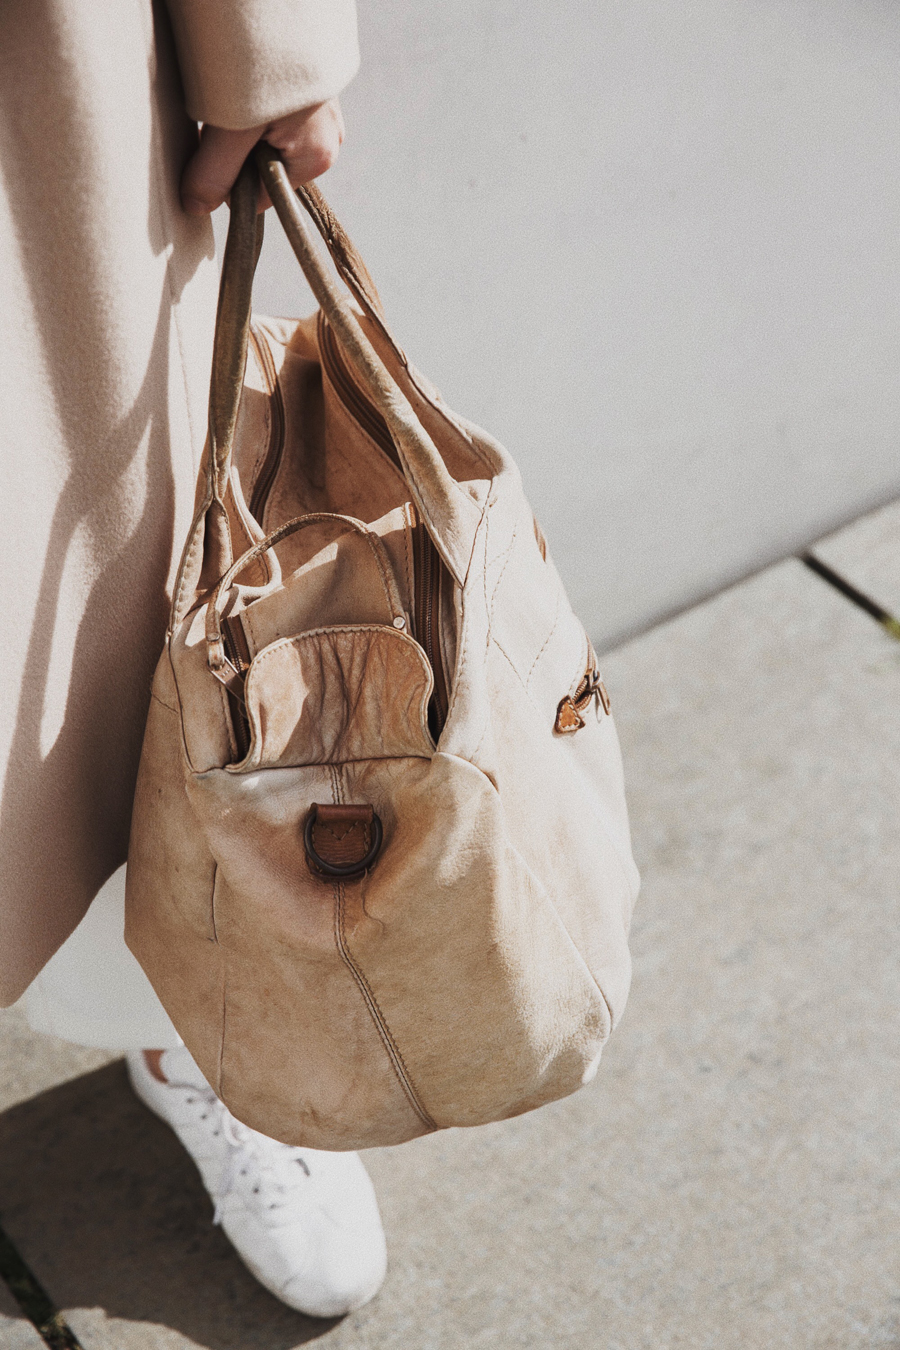 streetstyle-fashionblogger-camel-coat-romina-mey-tasche